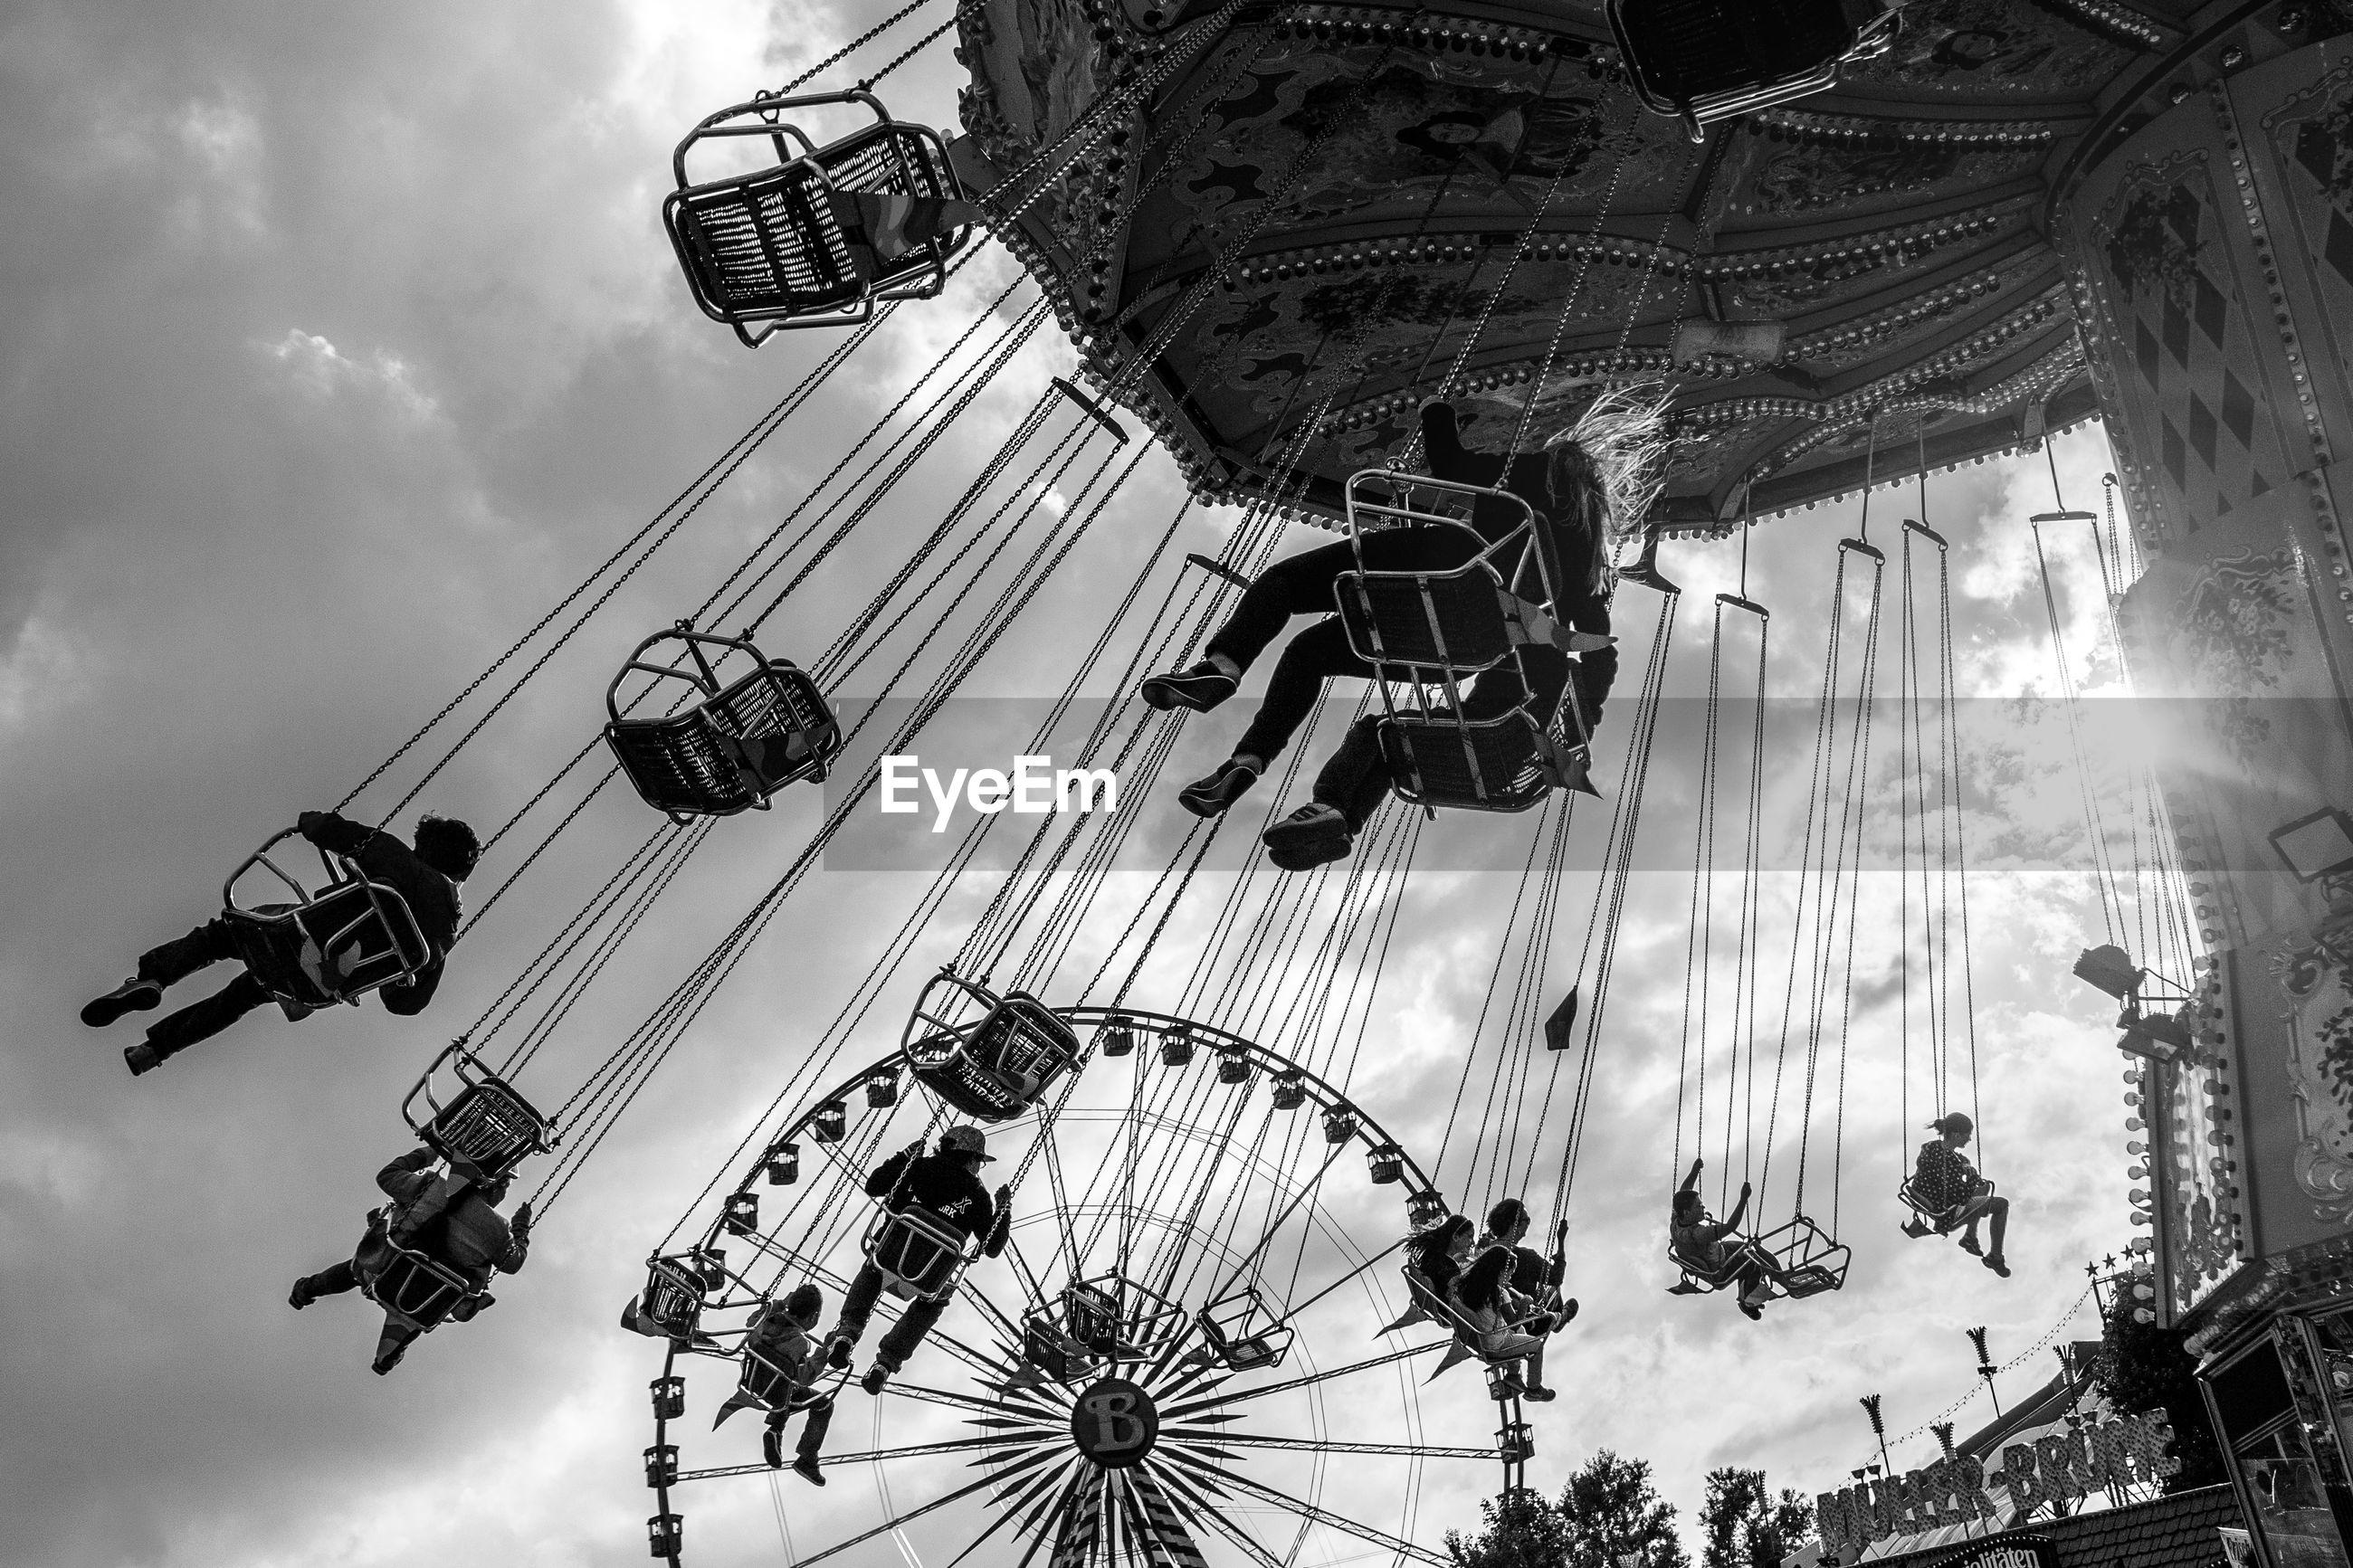 low angle view, sky, architecture, built structure, building exterior, tree, cloud - sky, tall - high, amusement park, arts culture and entertainment, ferris wheel, amusement park ride, outdoors, cloudy, cloud, dusk, tower, no people, city, silhouette